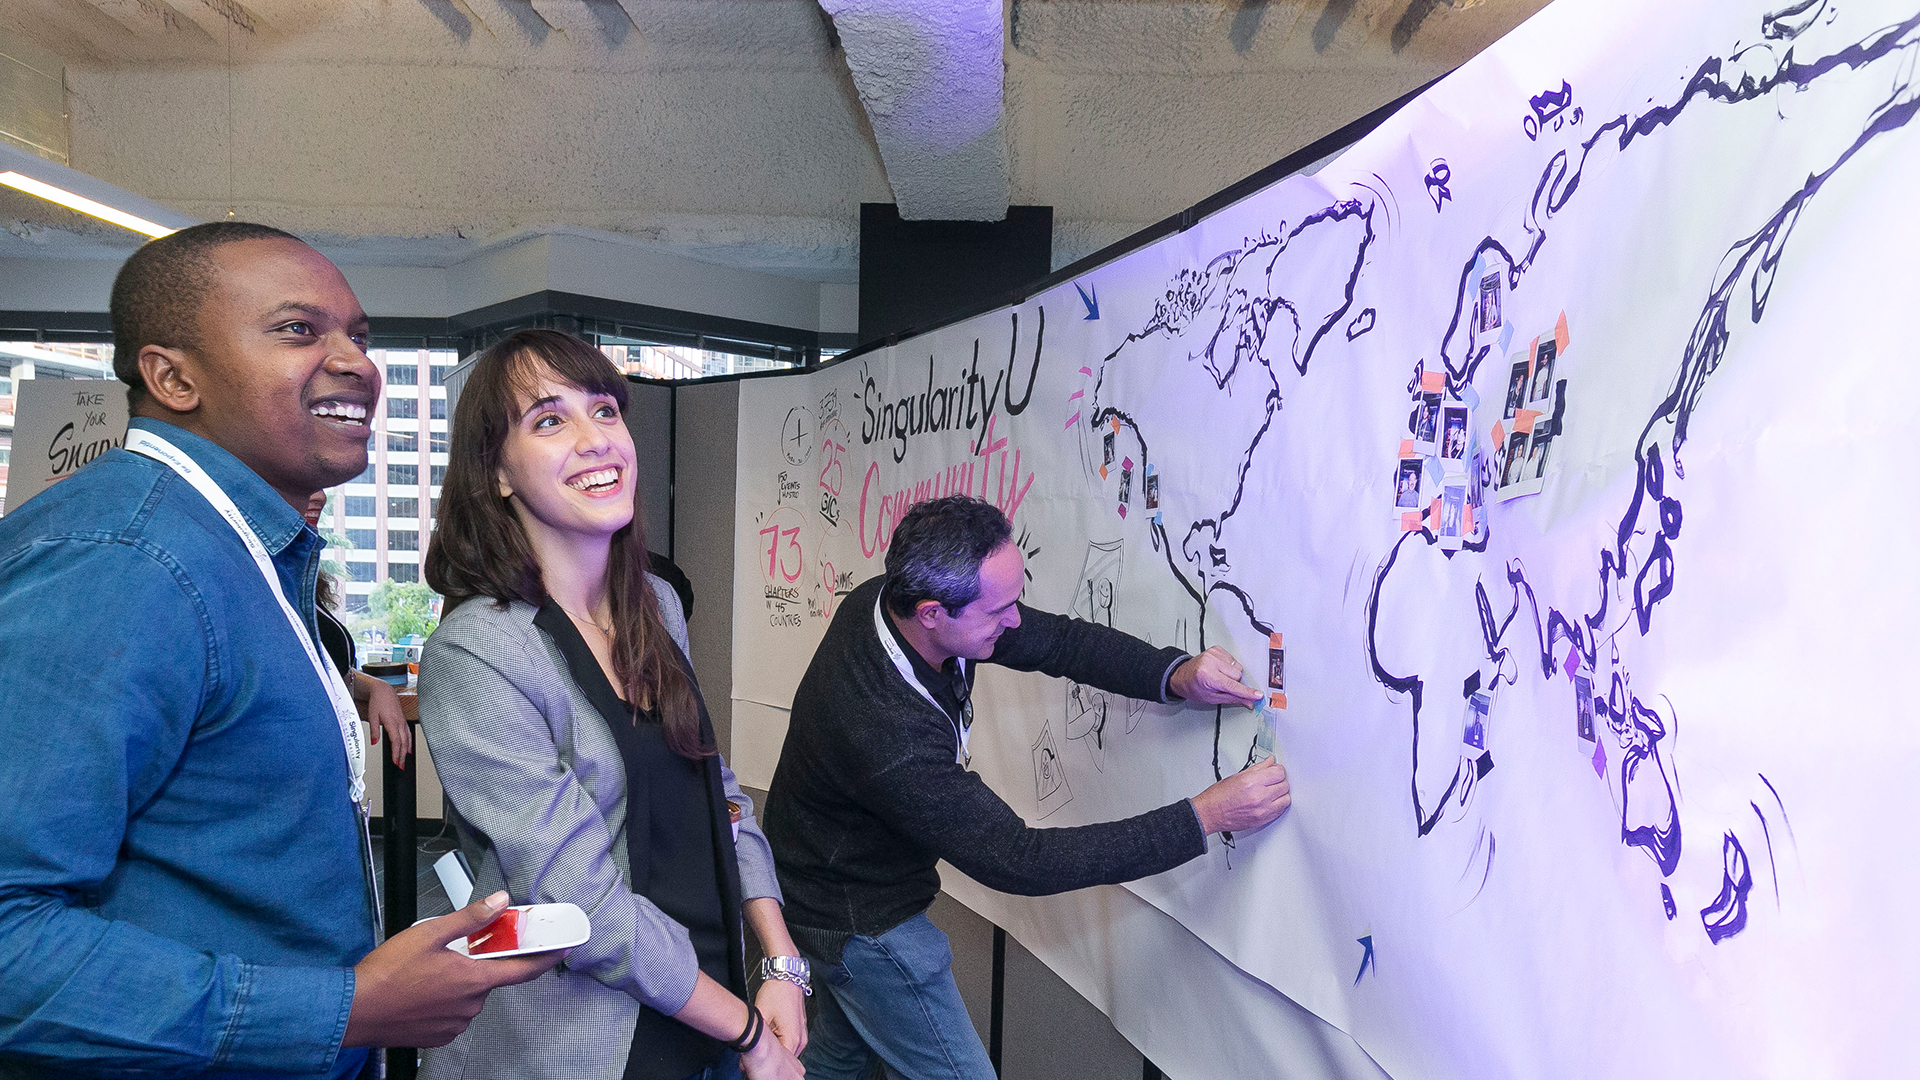 Kreatives_Singularity_Leadership_Google_05.jpg